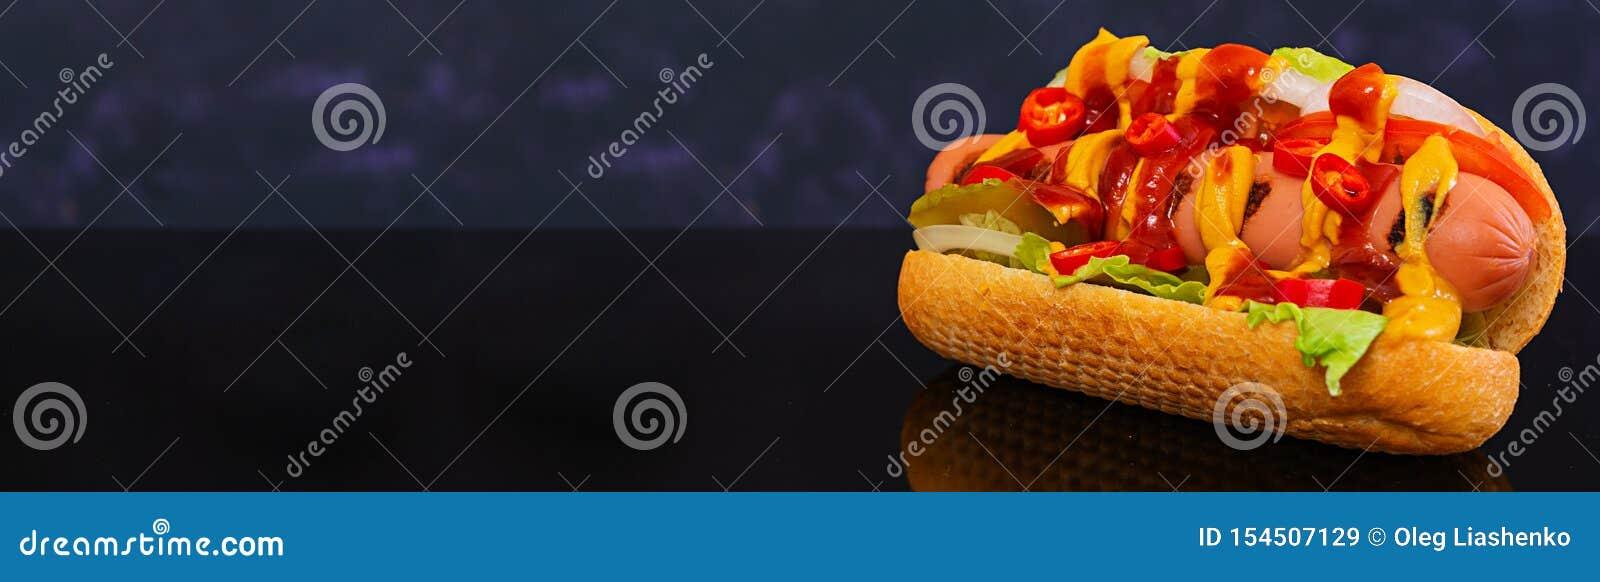 Delicious homemade hot dog on dark background. Banner